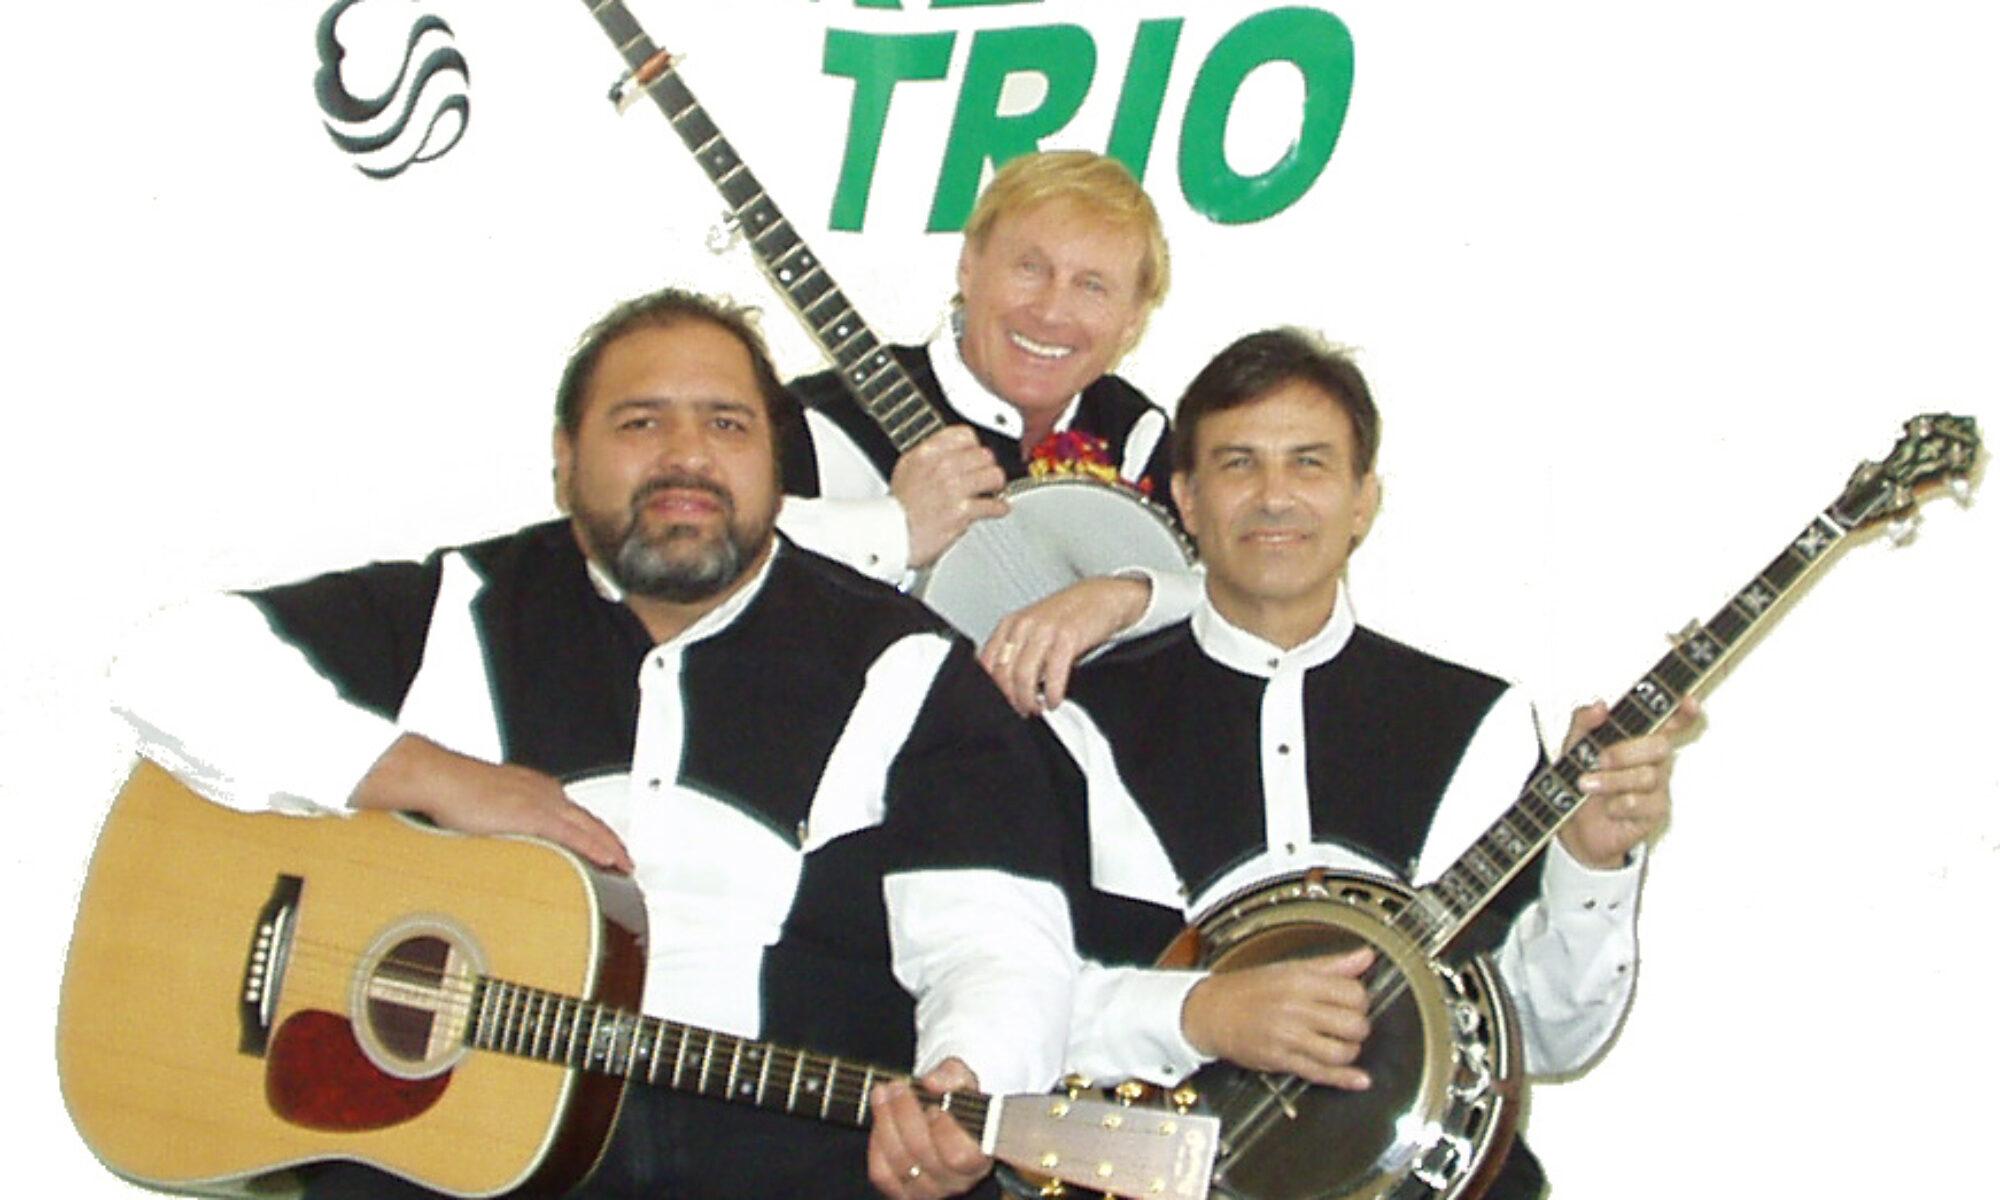 The Windsor Creek Trio